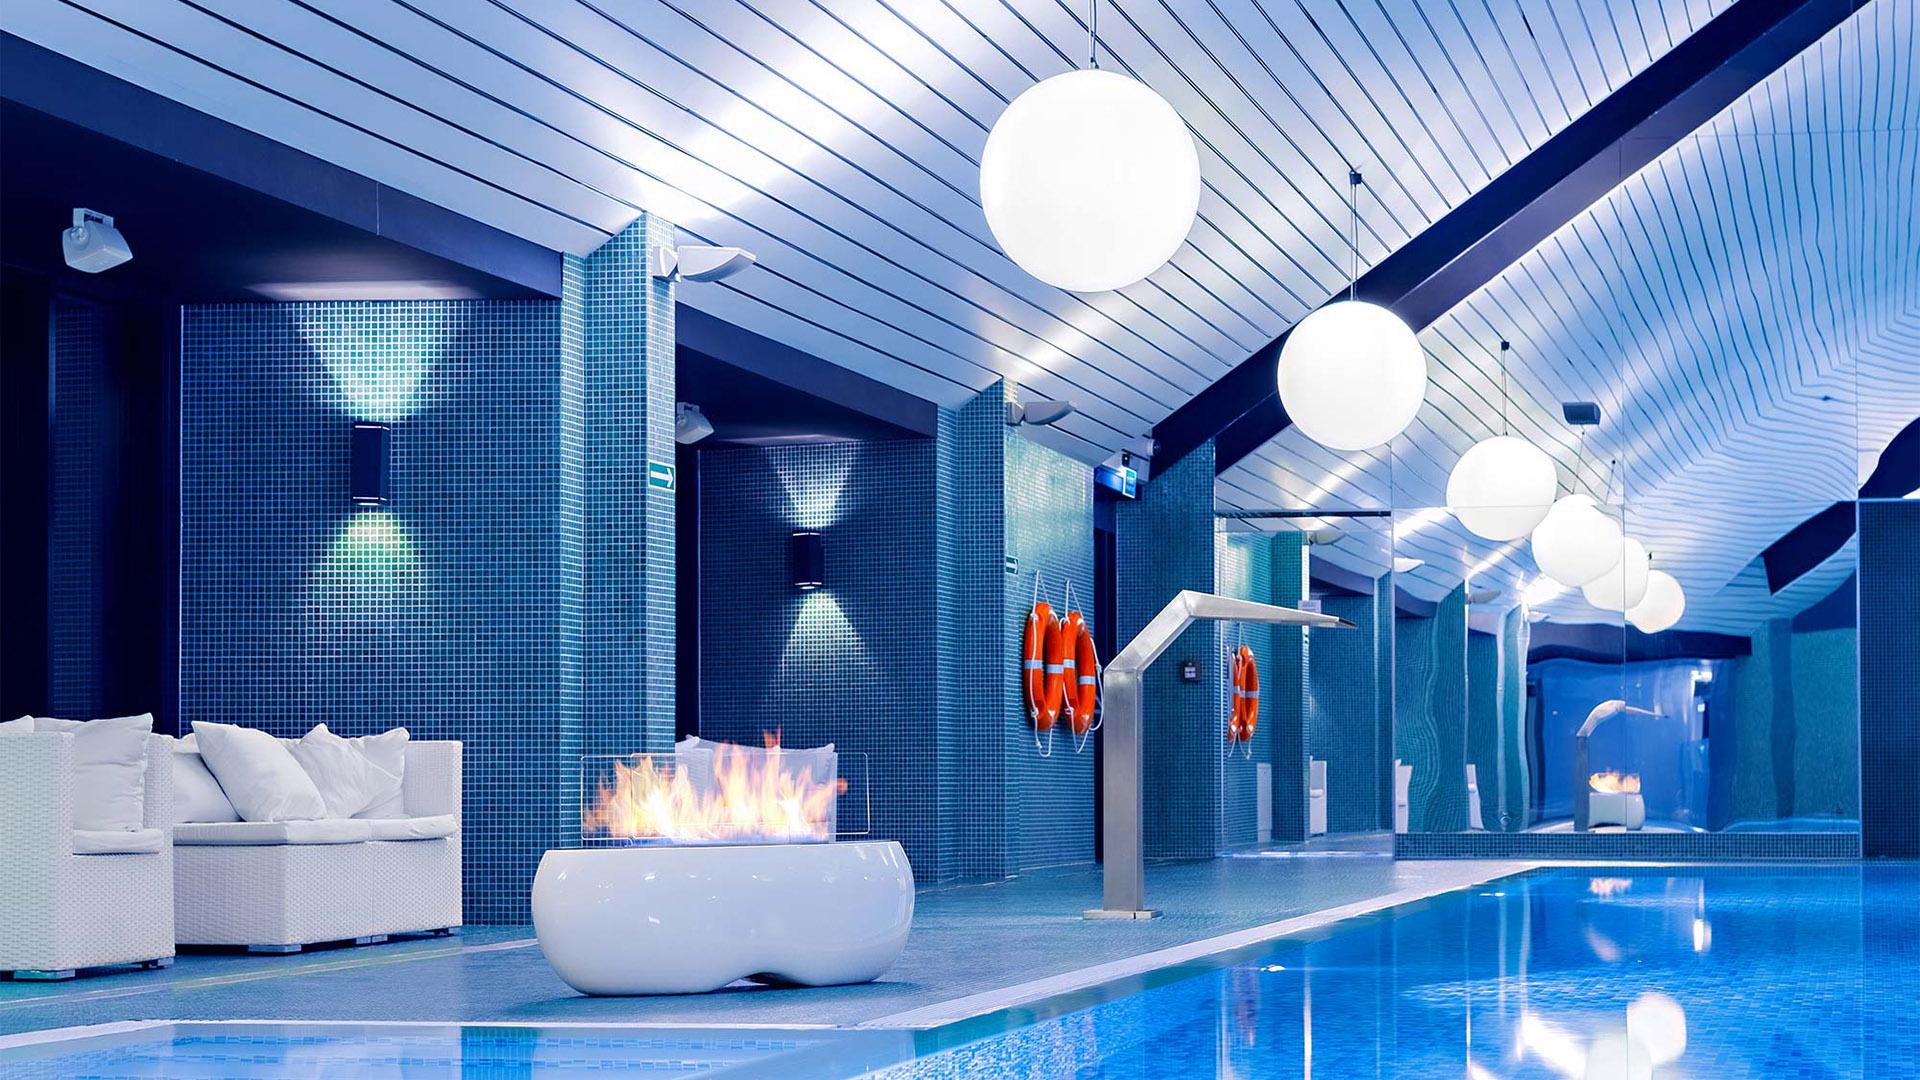 Poziom 511 design hotel spa podzamcze k for Design hotel spa